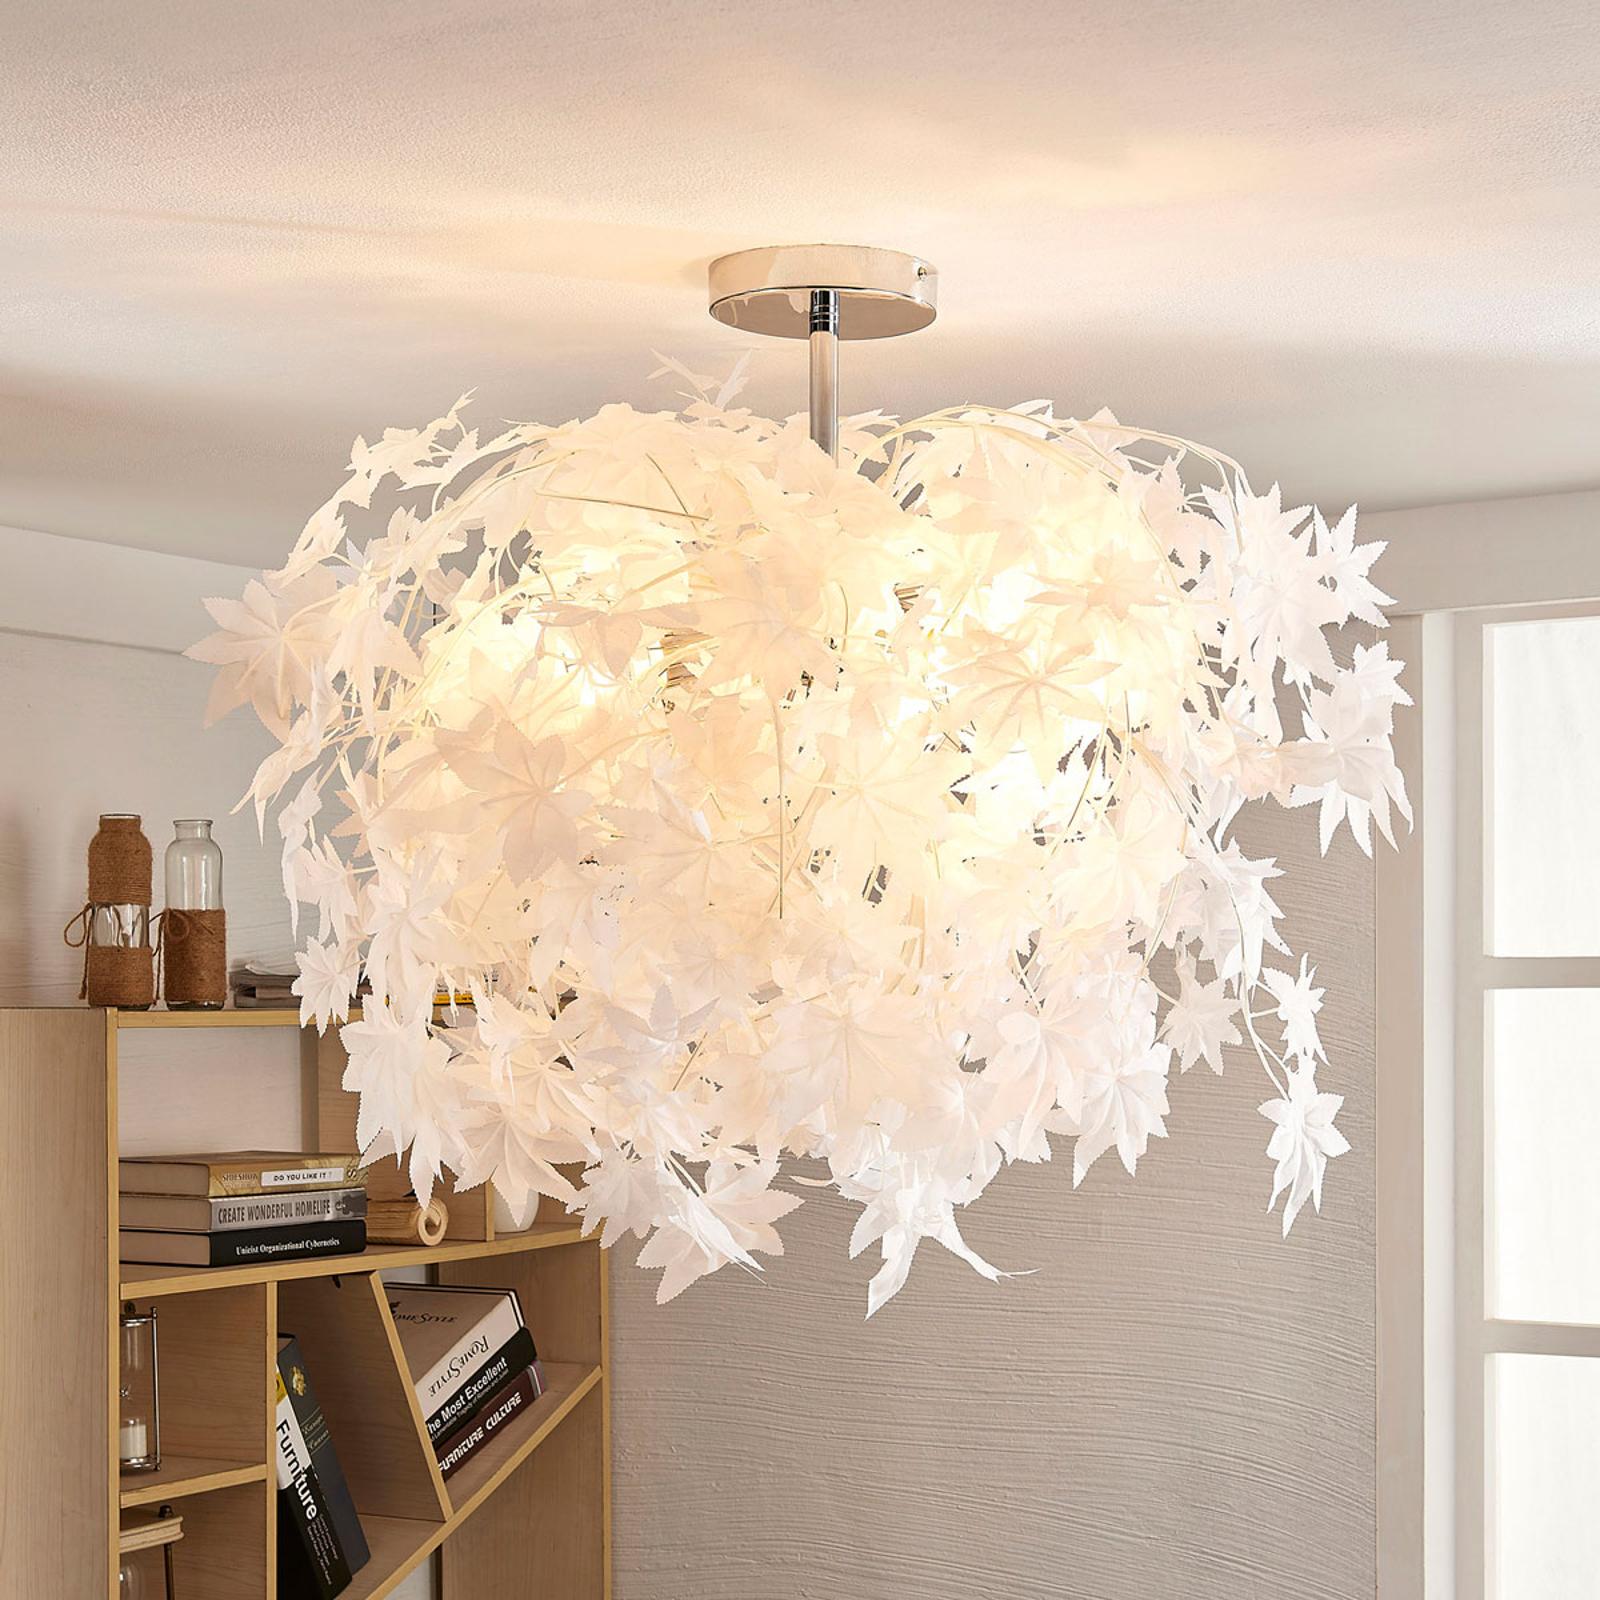 Fortryllende taklampe Maple med blad